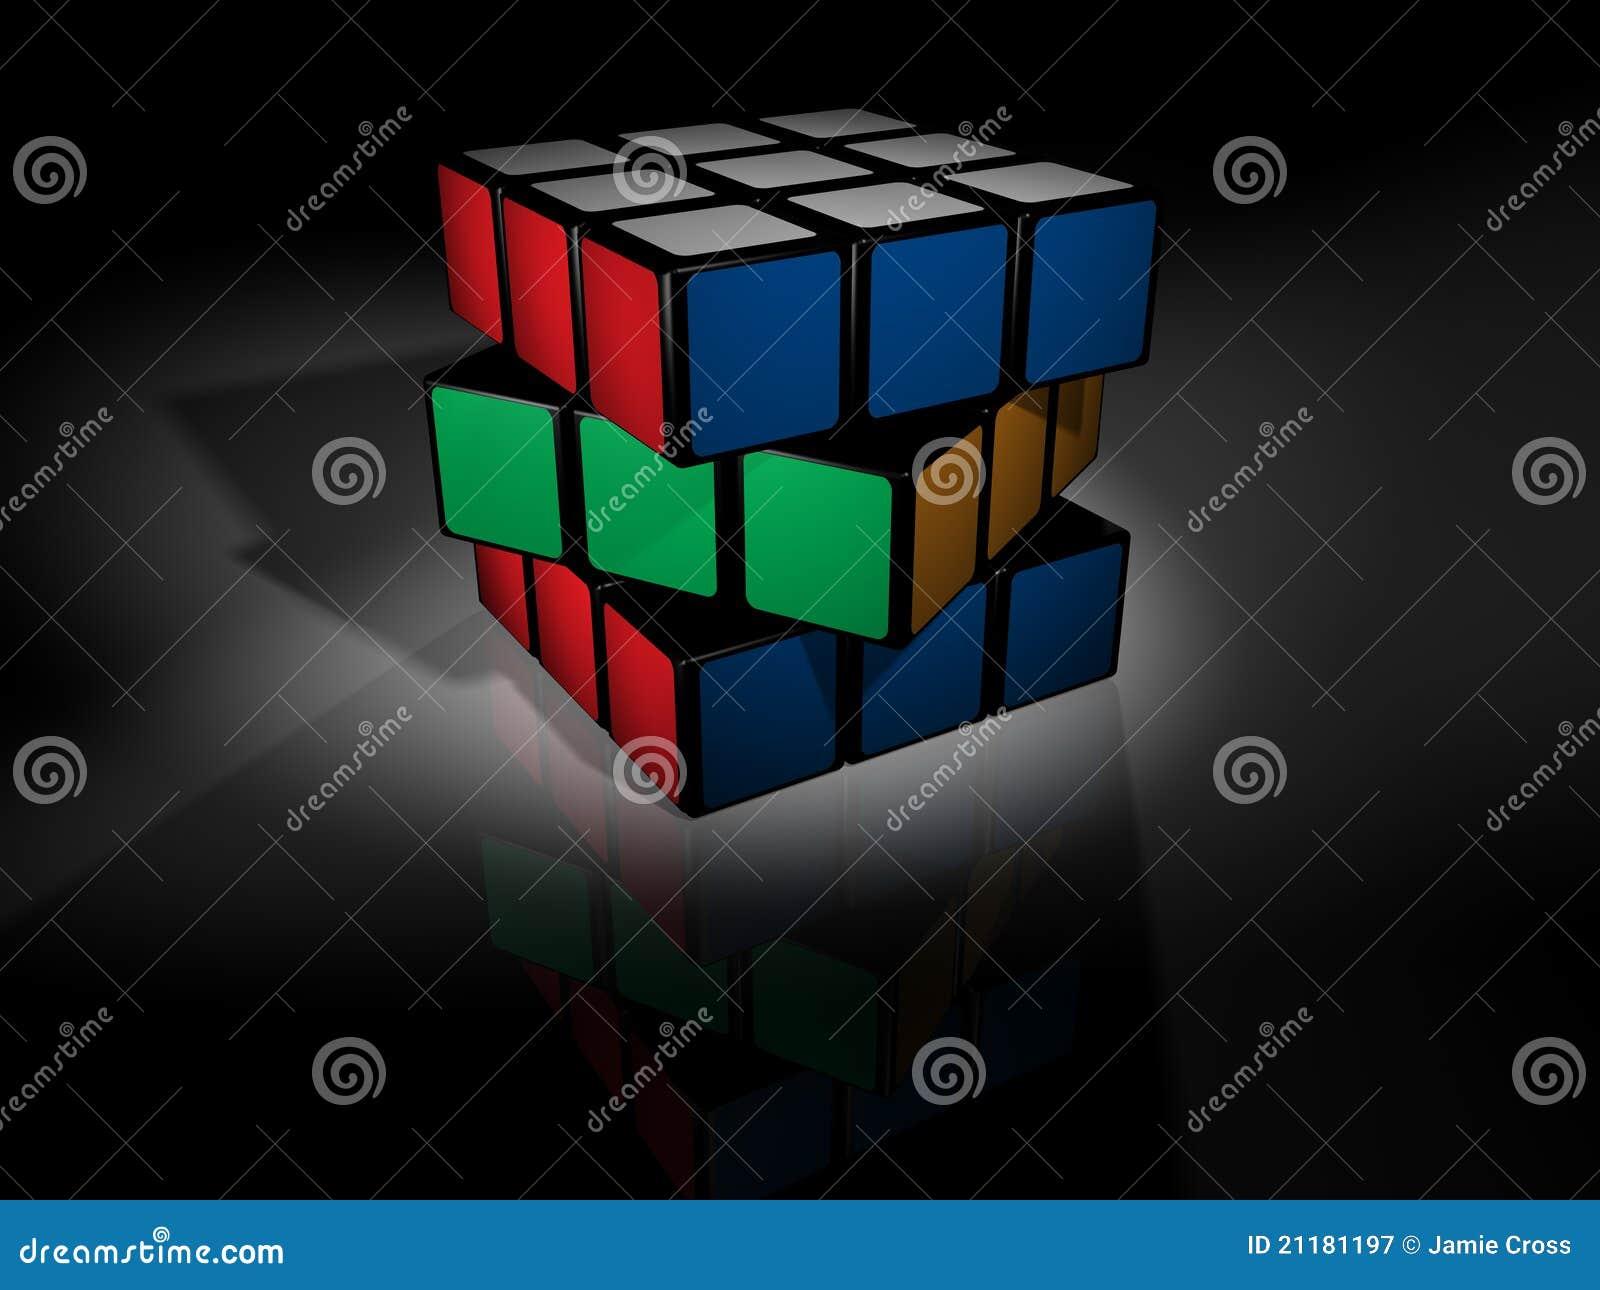 Unsolved rubik s cube on black